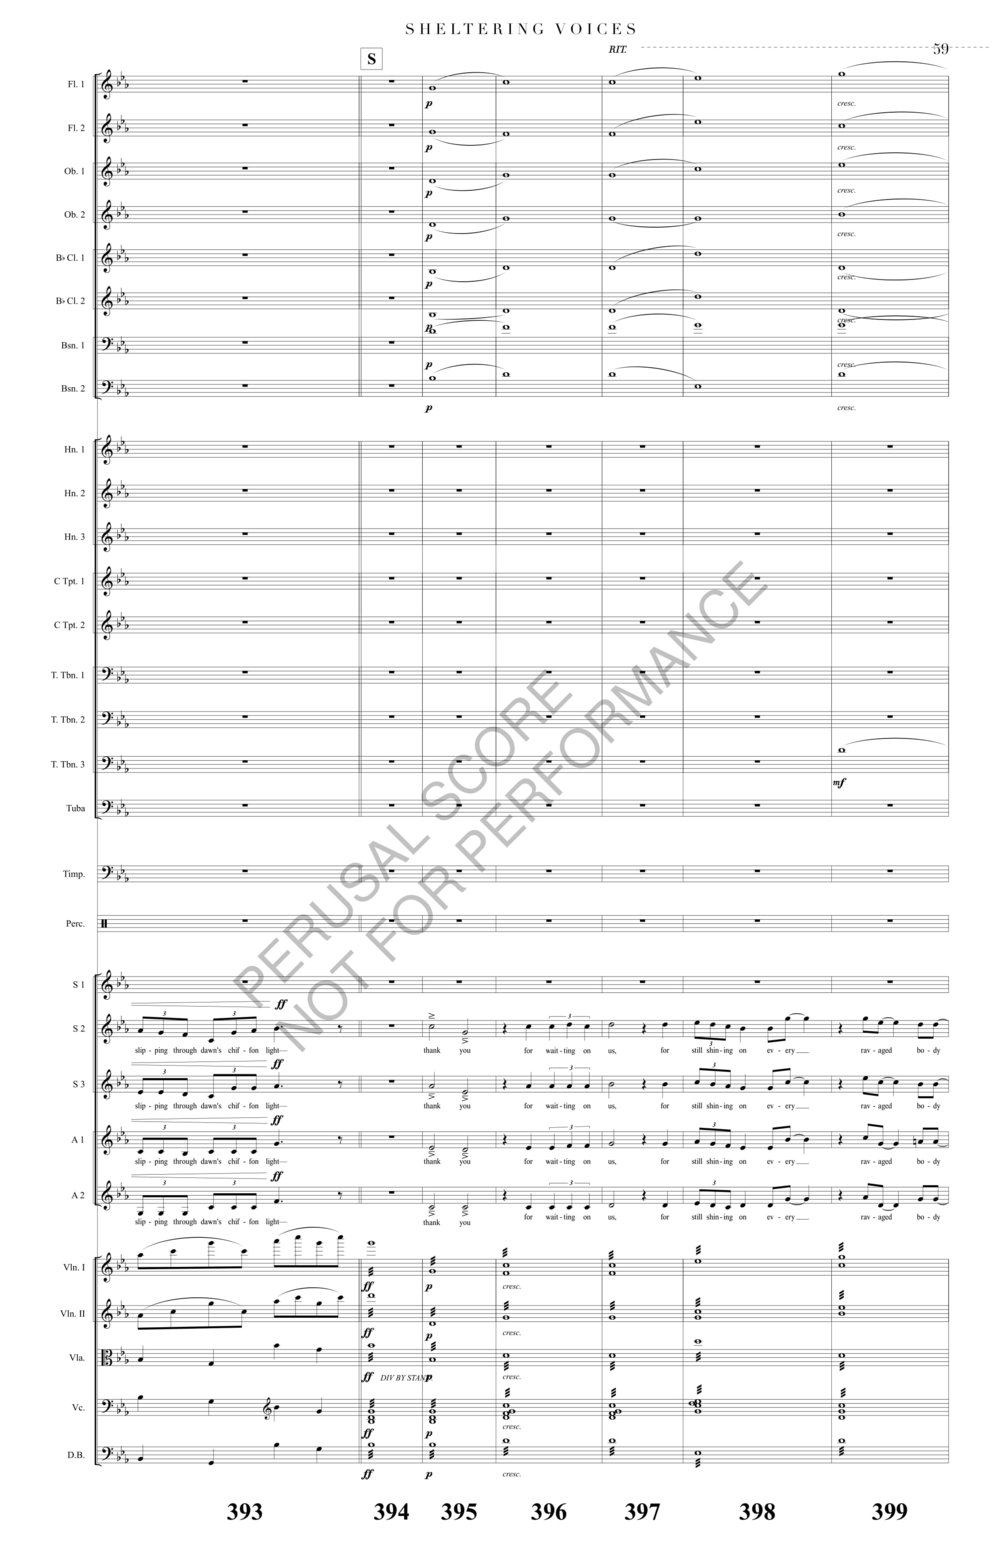 Boyd Sheltering Voices Score-watermark-67.jpg